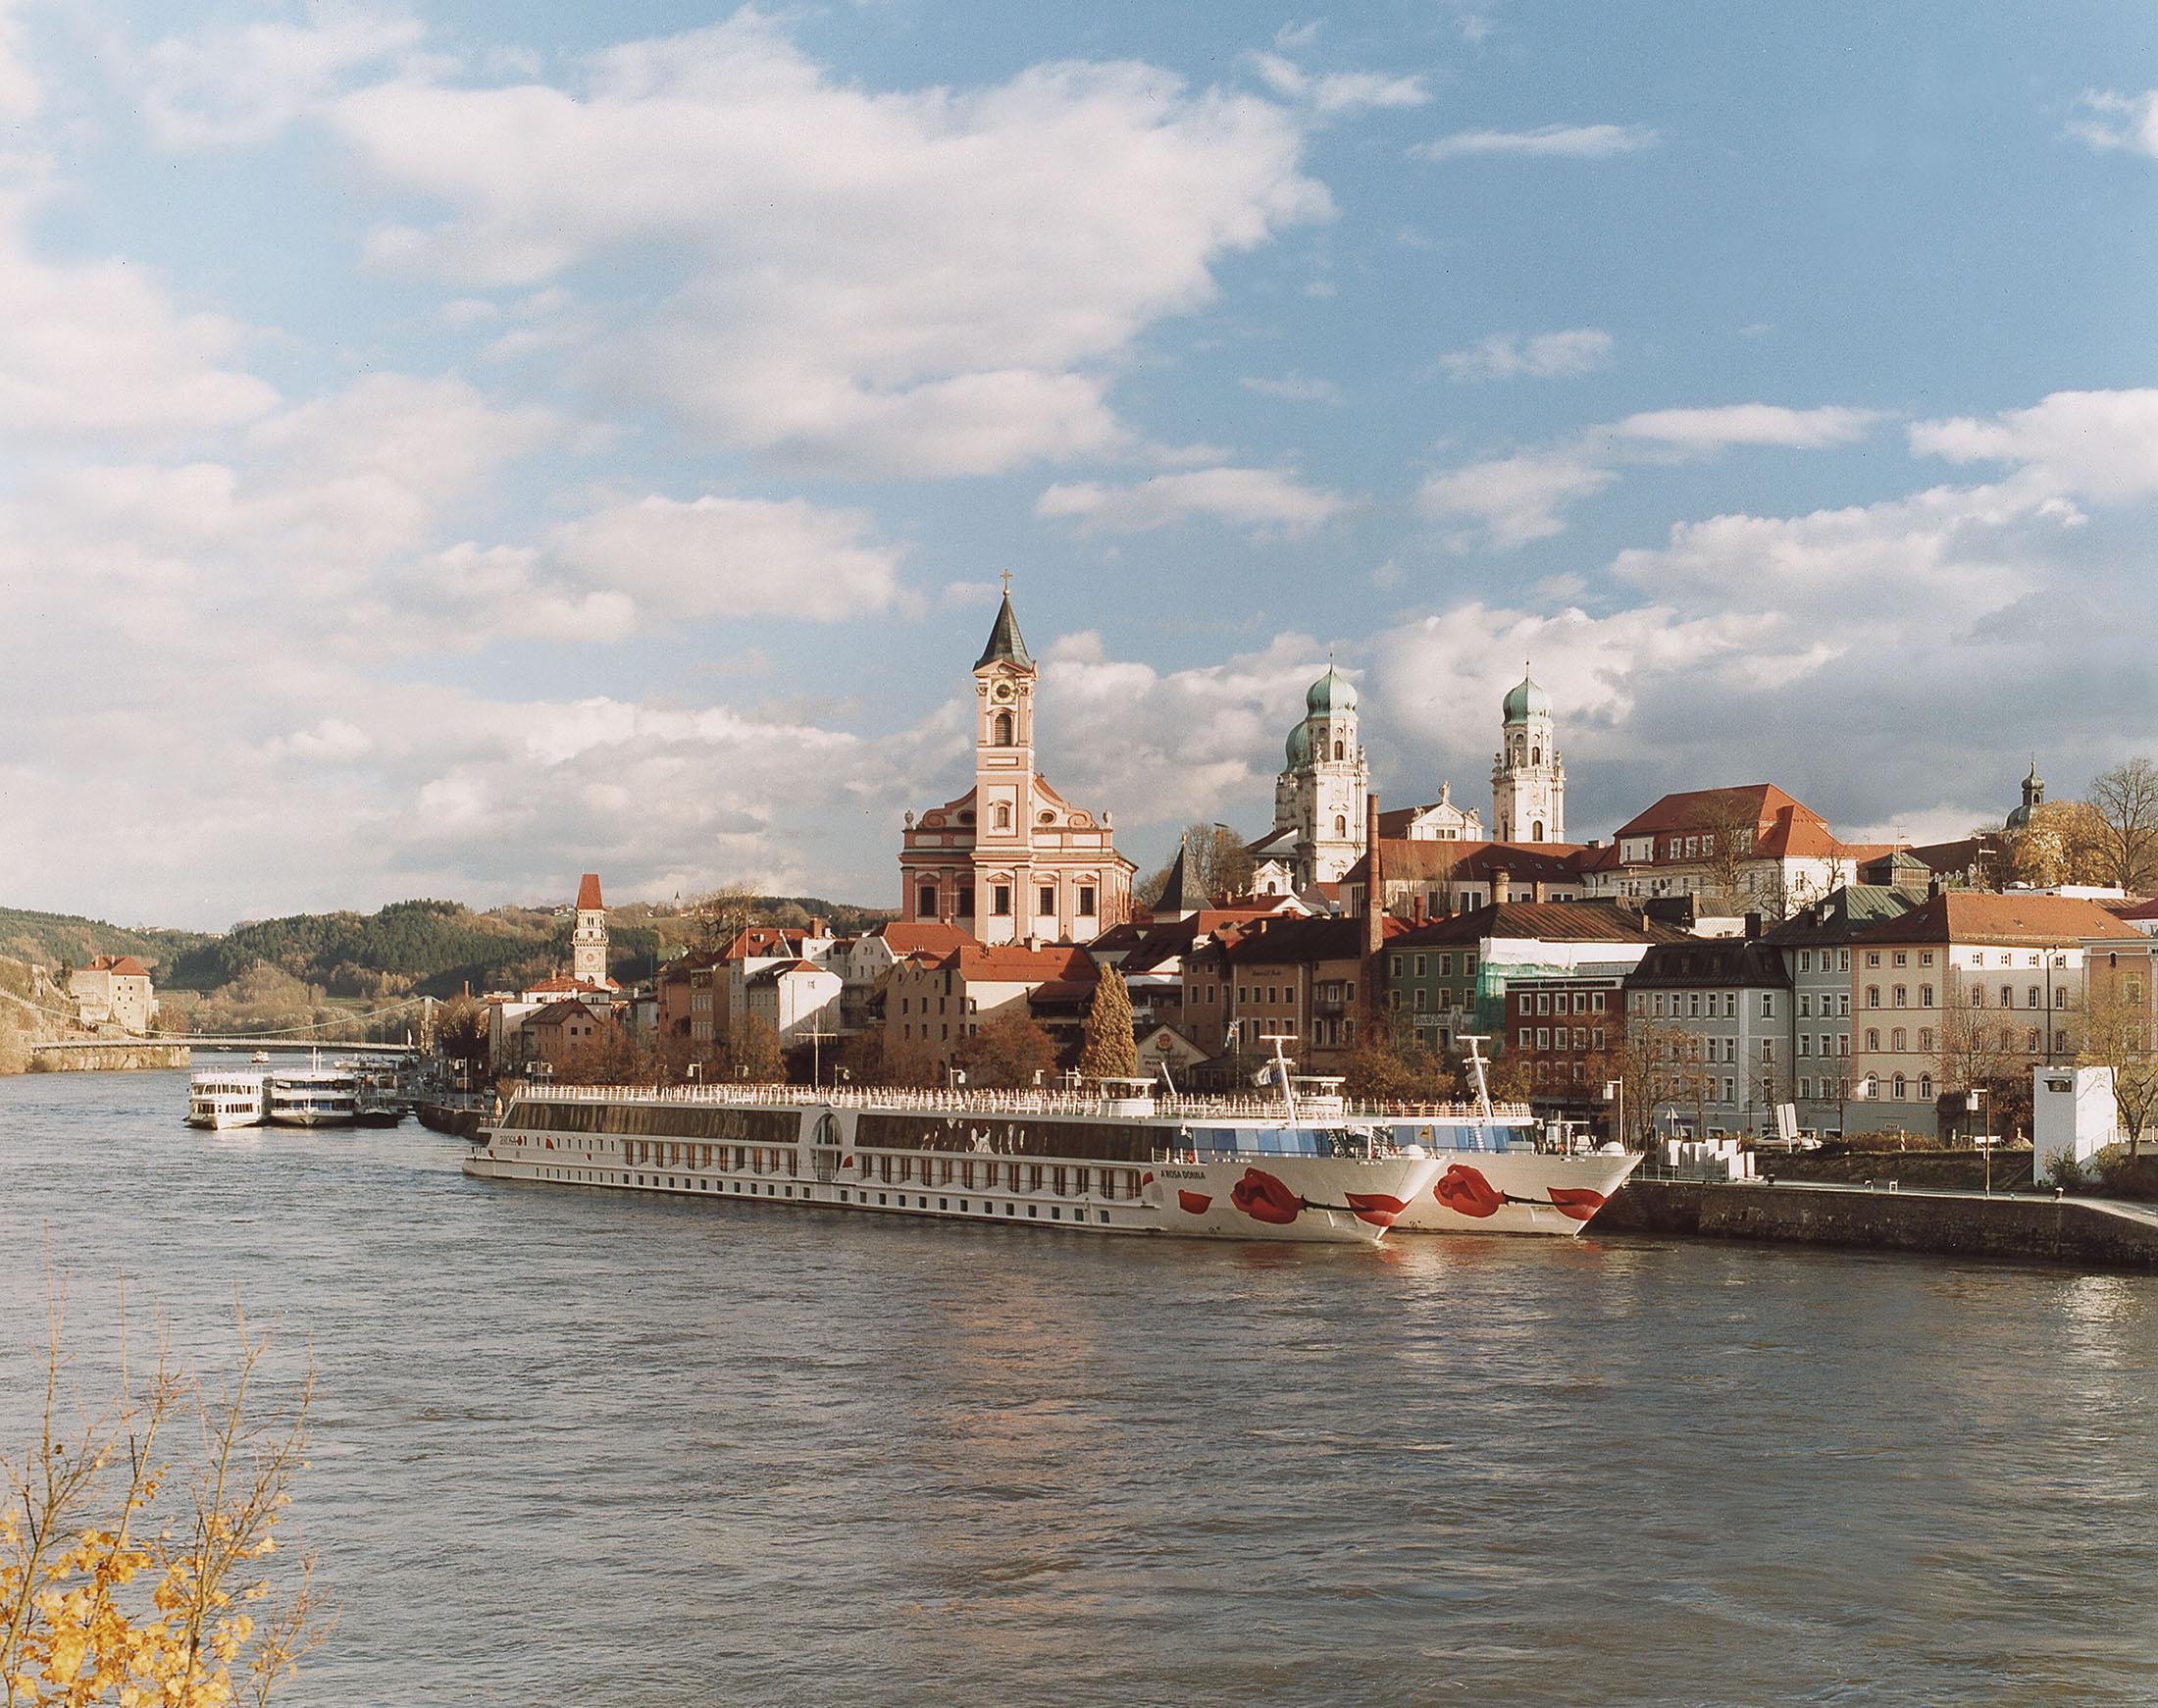 Cruise ships in Passau - Kreuzfahrtschiffe in Passau